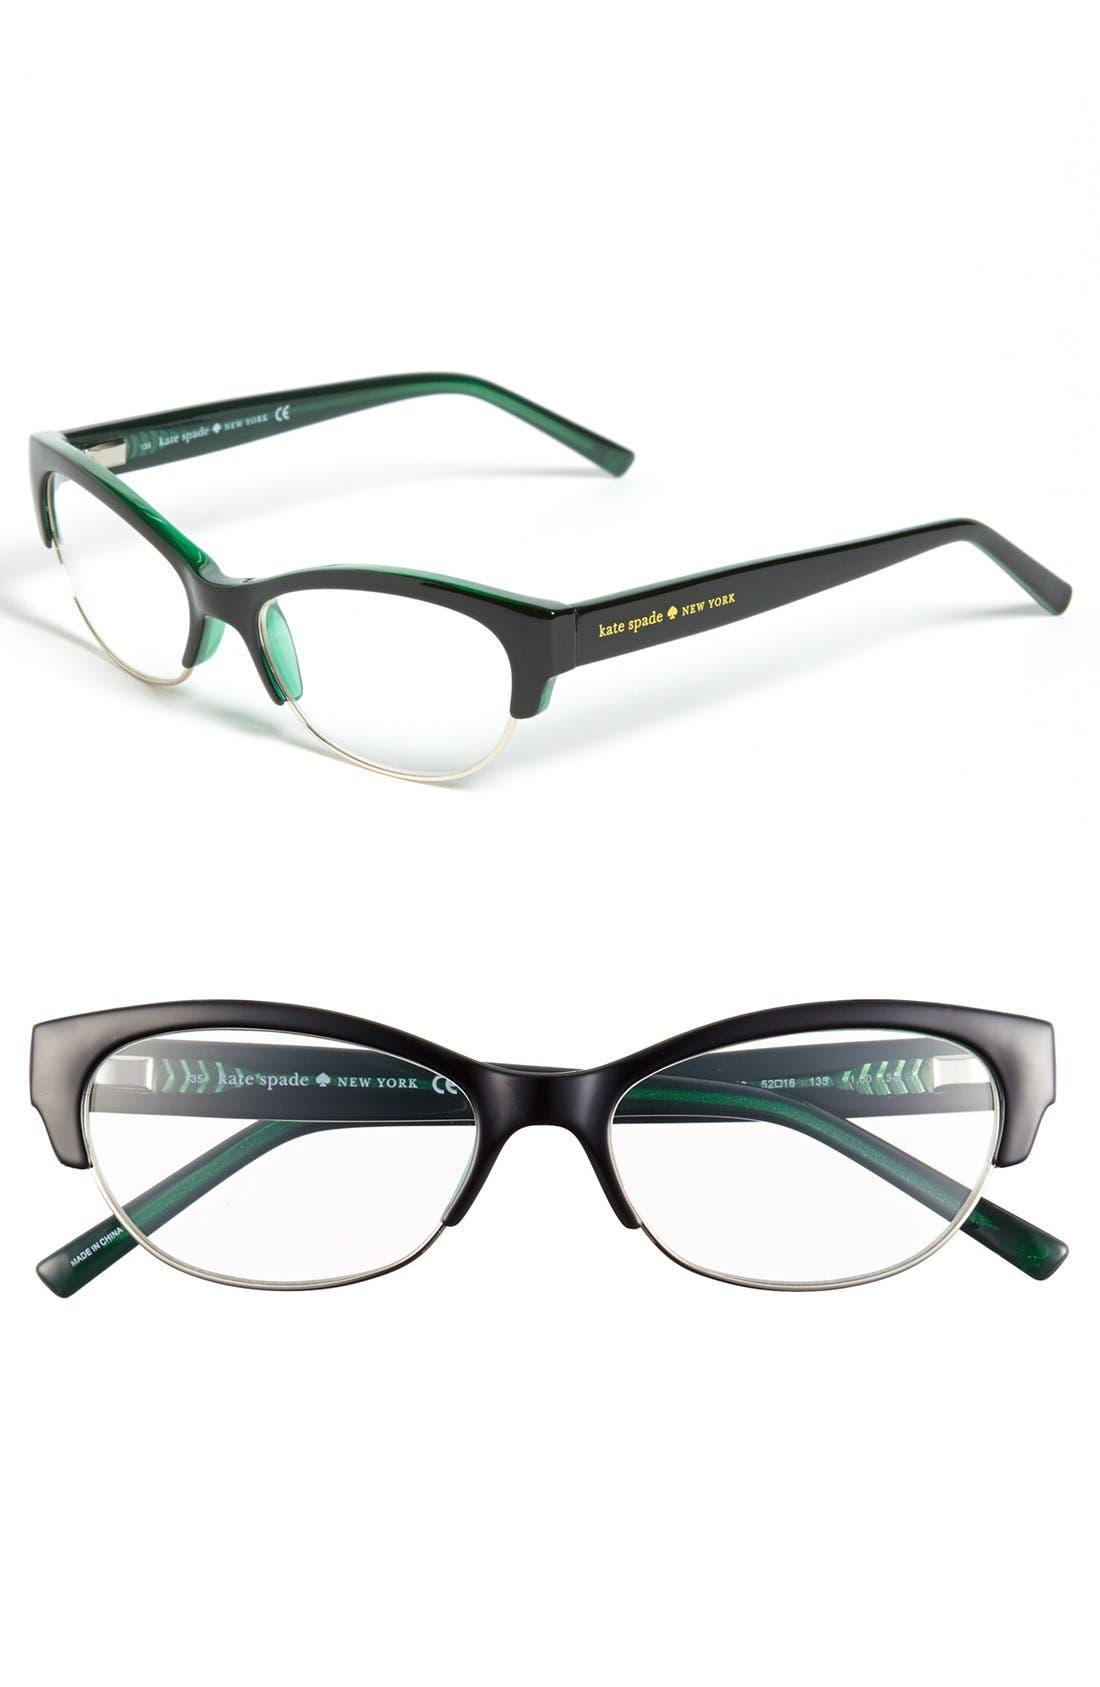 Main Image - kate spade new york 'aleta' 52mm reading glasses (2 for $88)